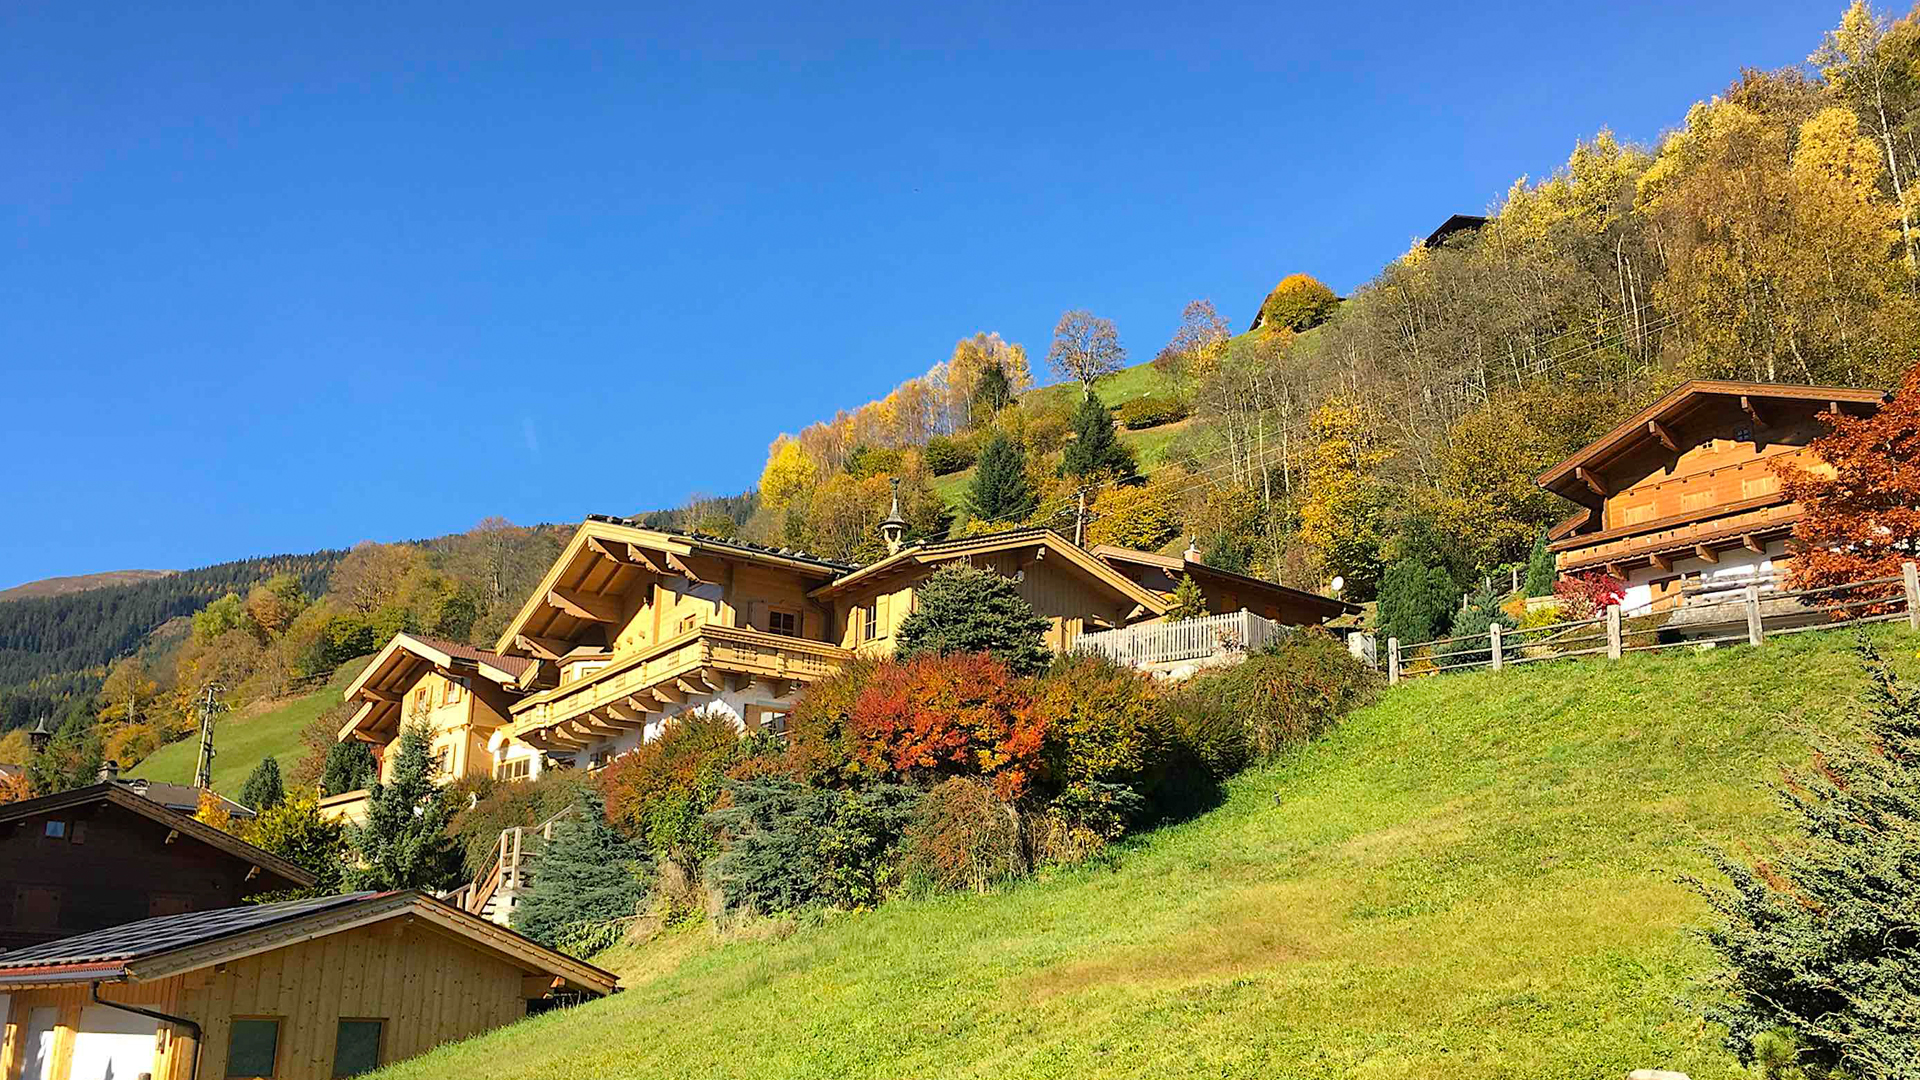 Chalet Annabelle Chalet, Austria